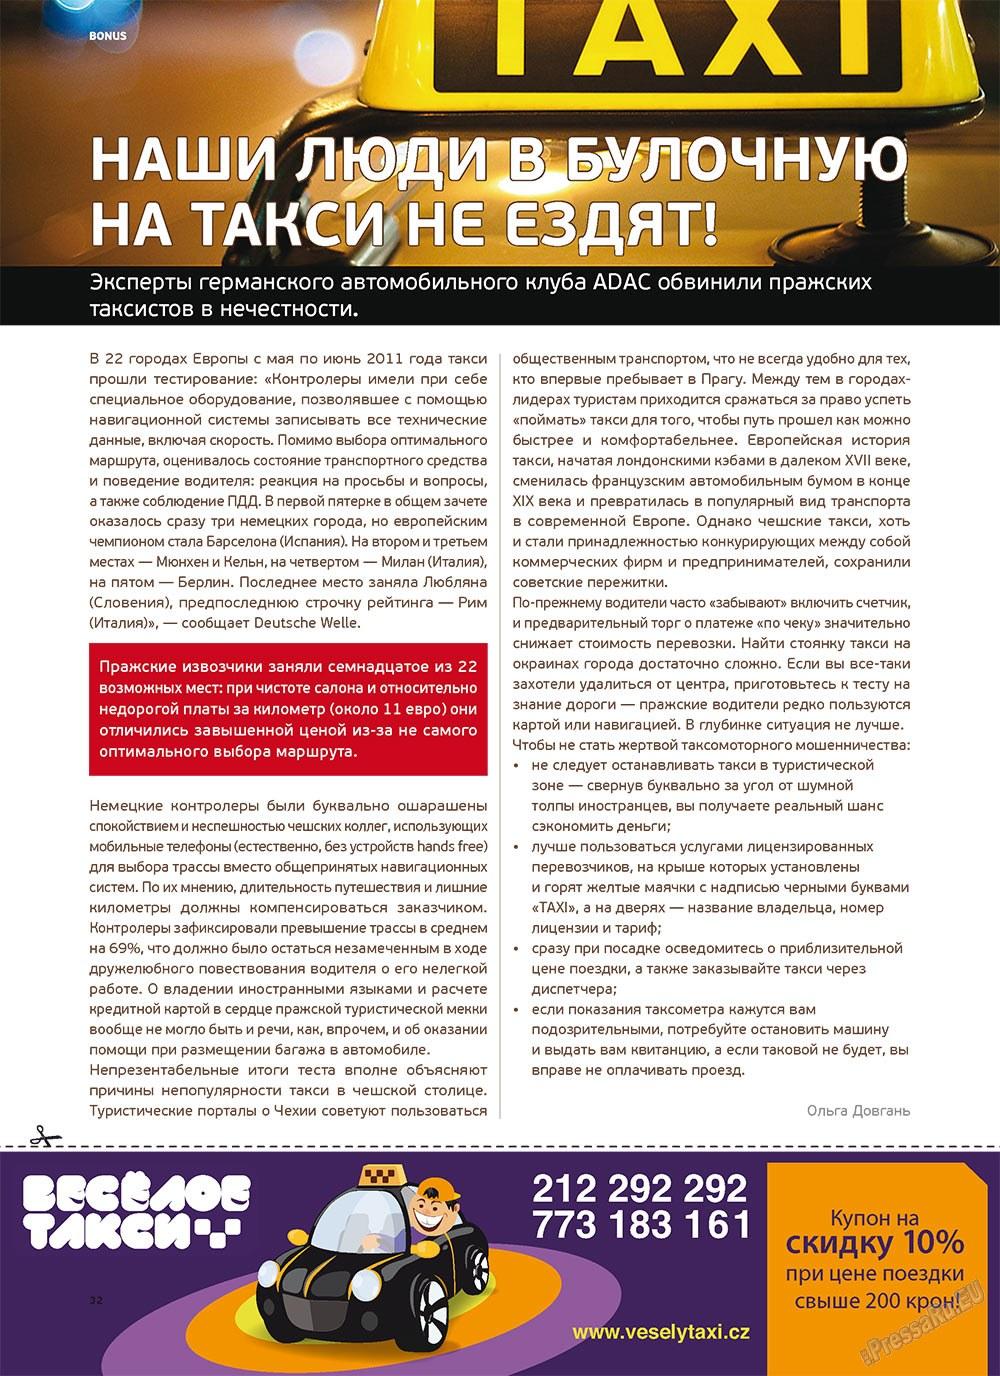 Артек (журнал). 2011 год, номер 4, стр. 34